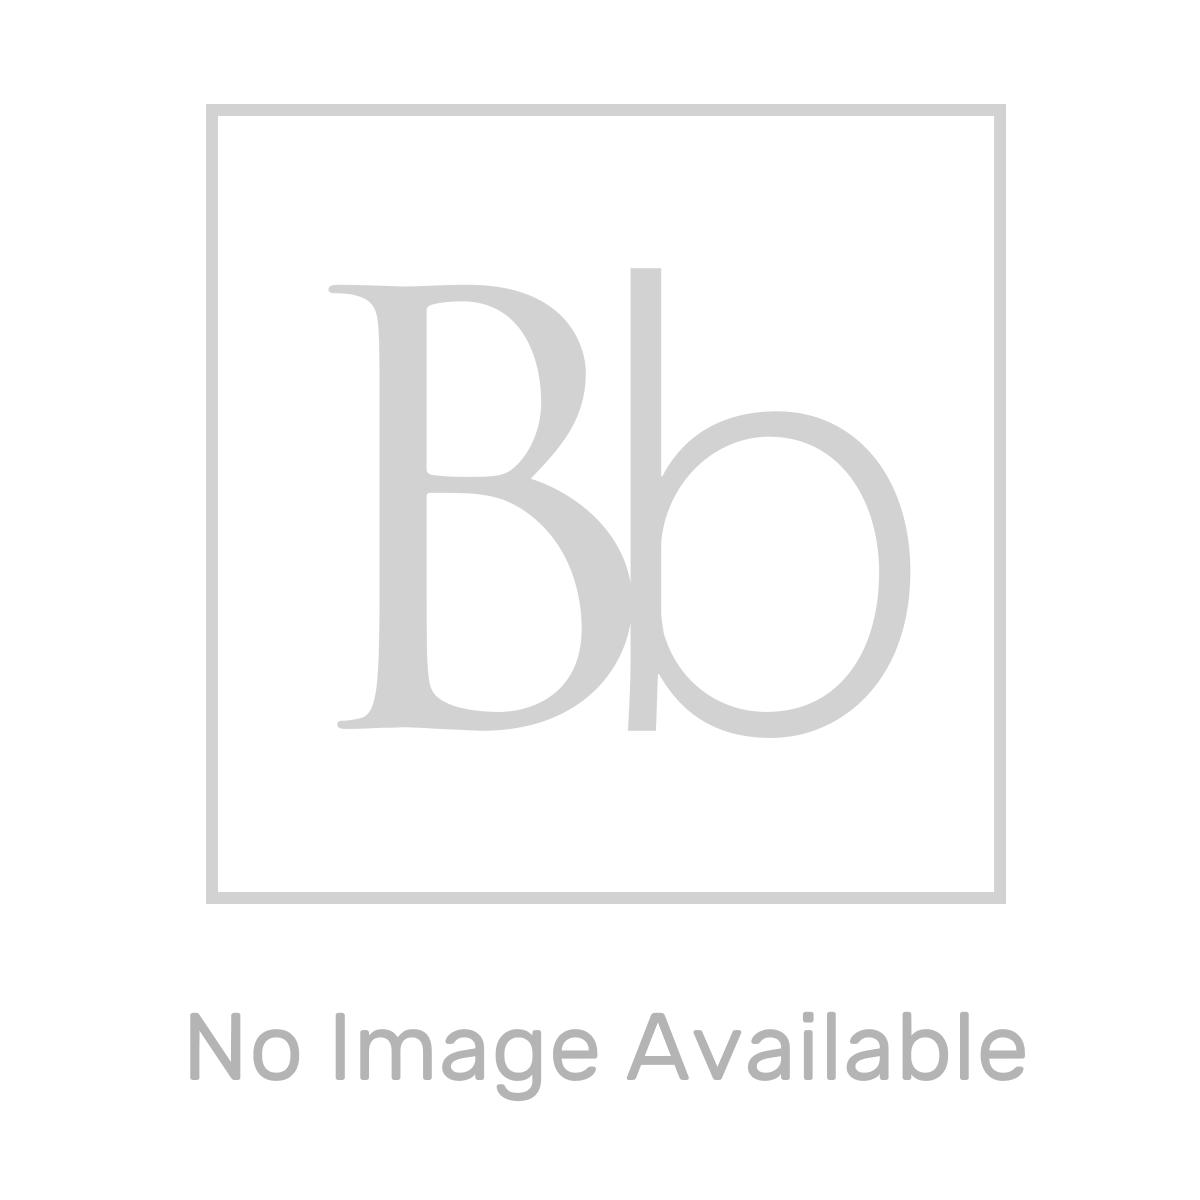 RAK Moon Freestanding Shower Bath Mixer Tap